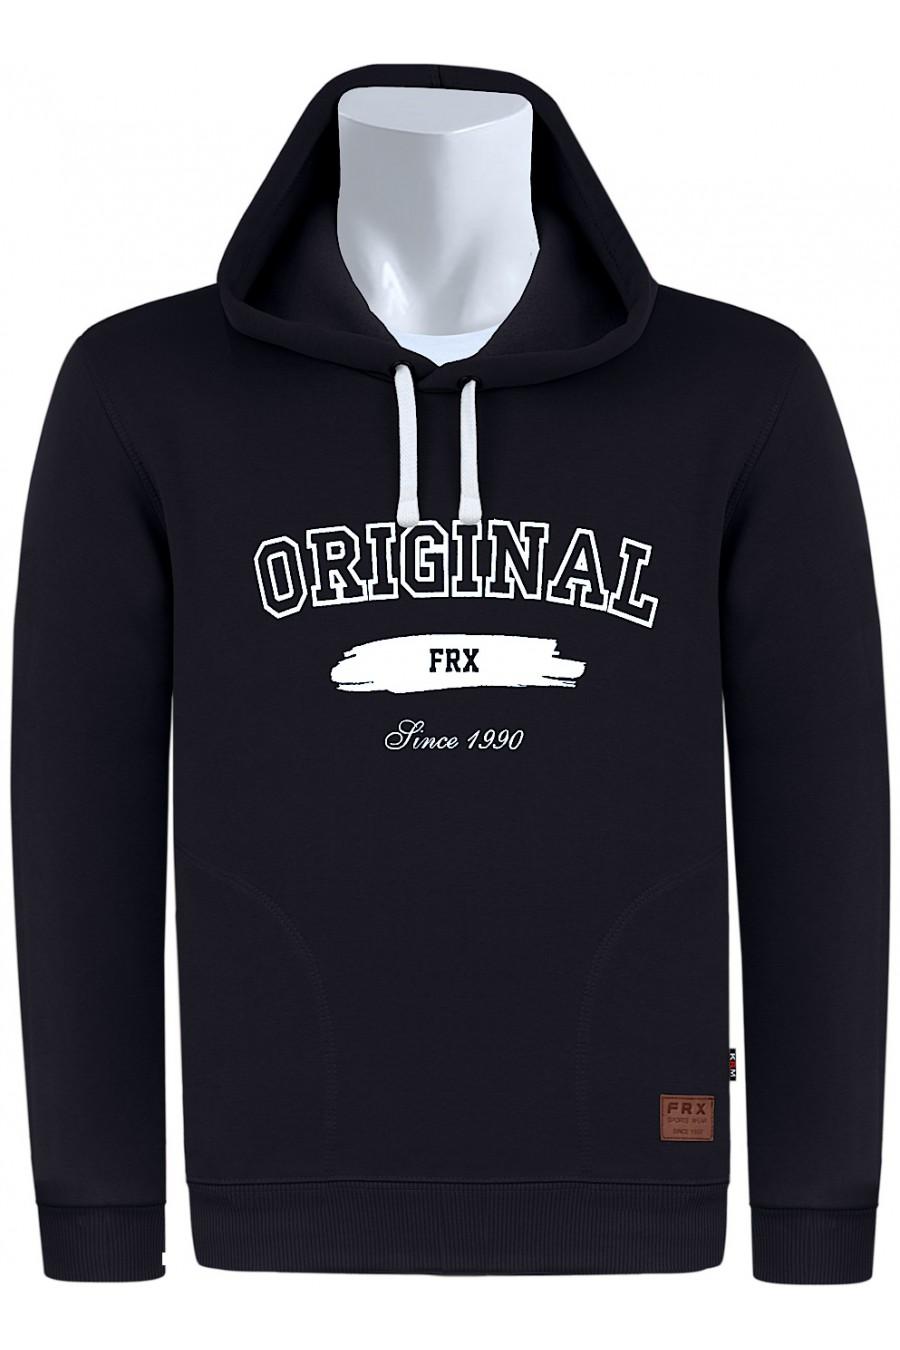 Bluza z kapturem FR/K M-8XL czarna